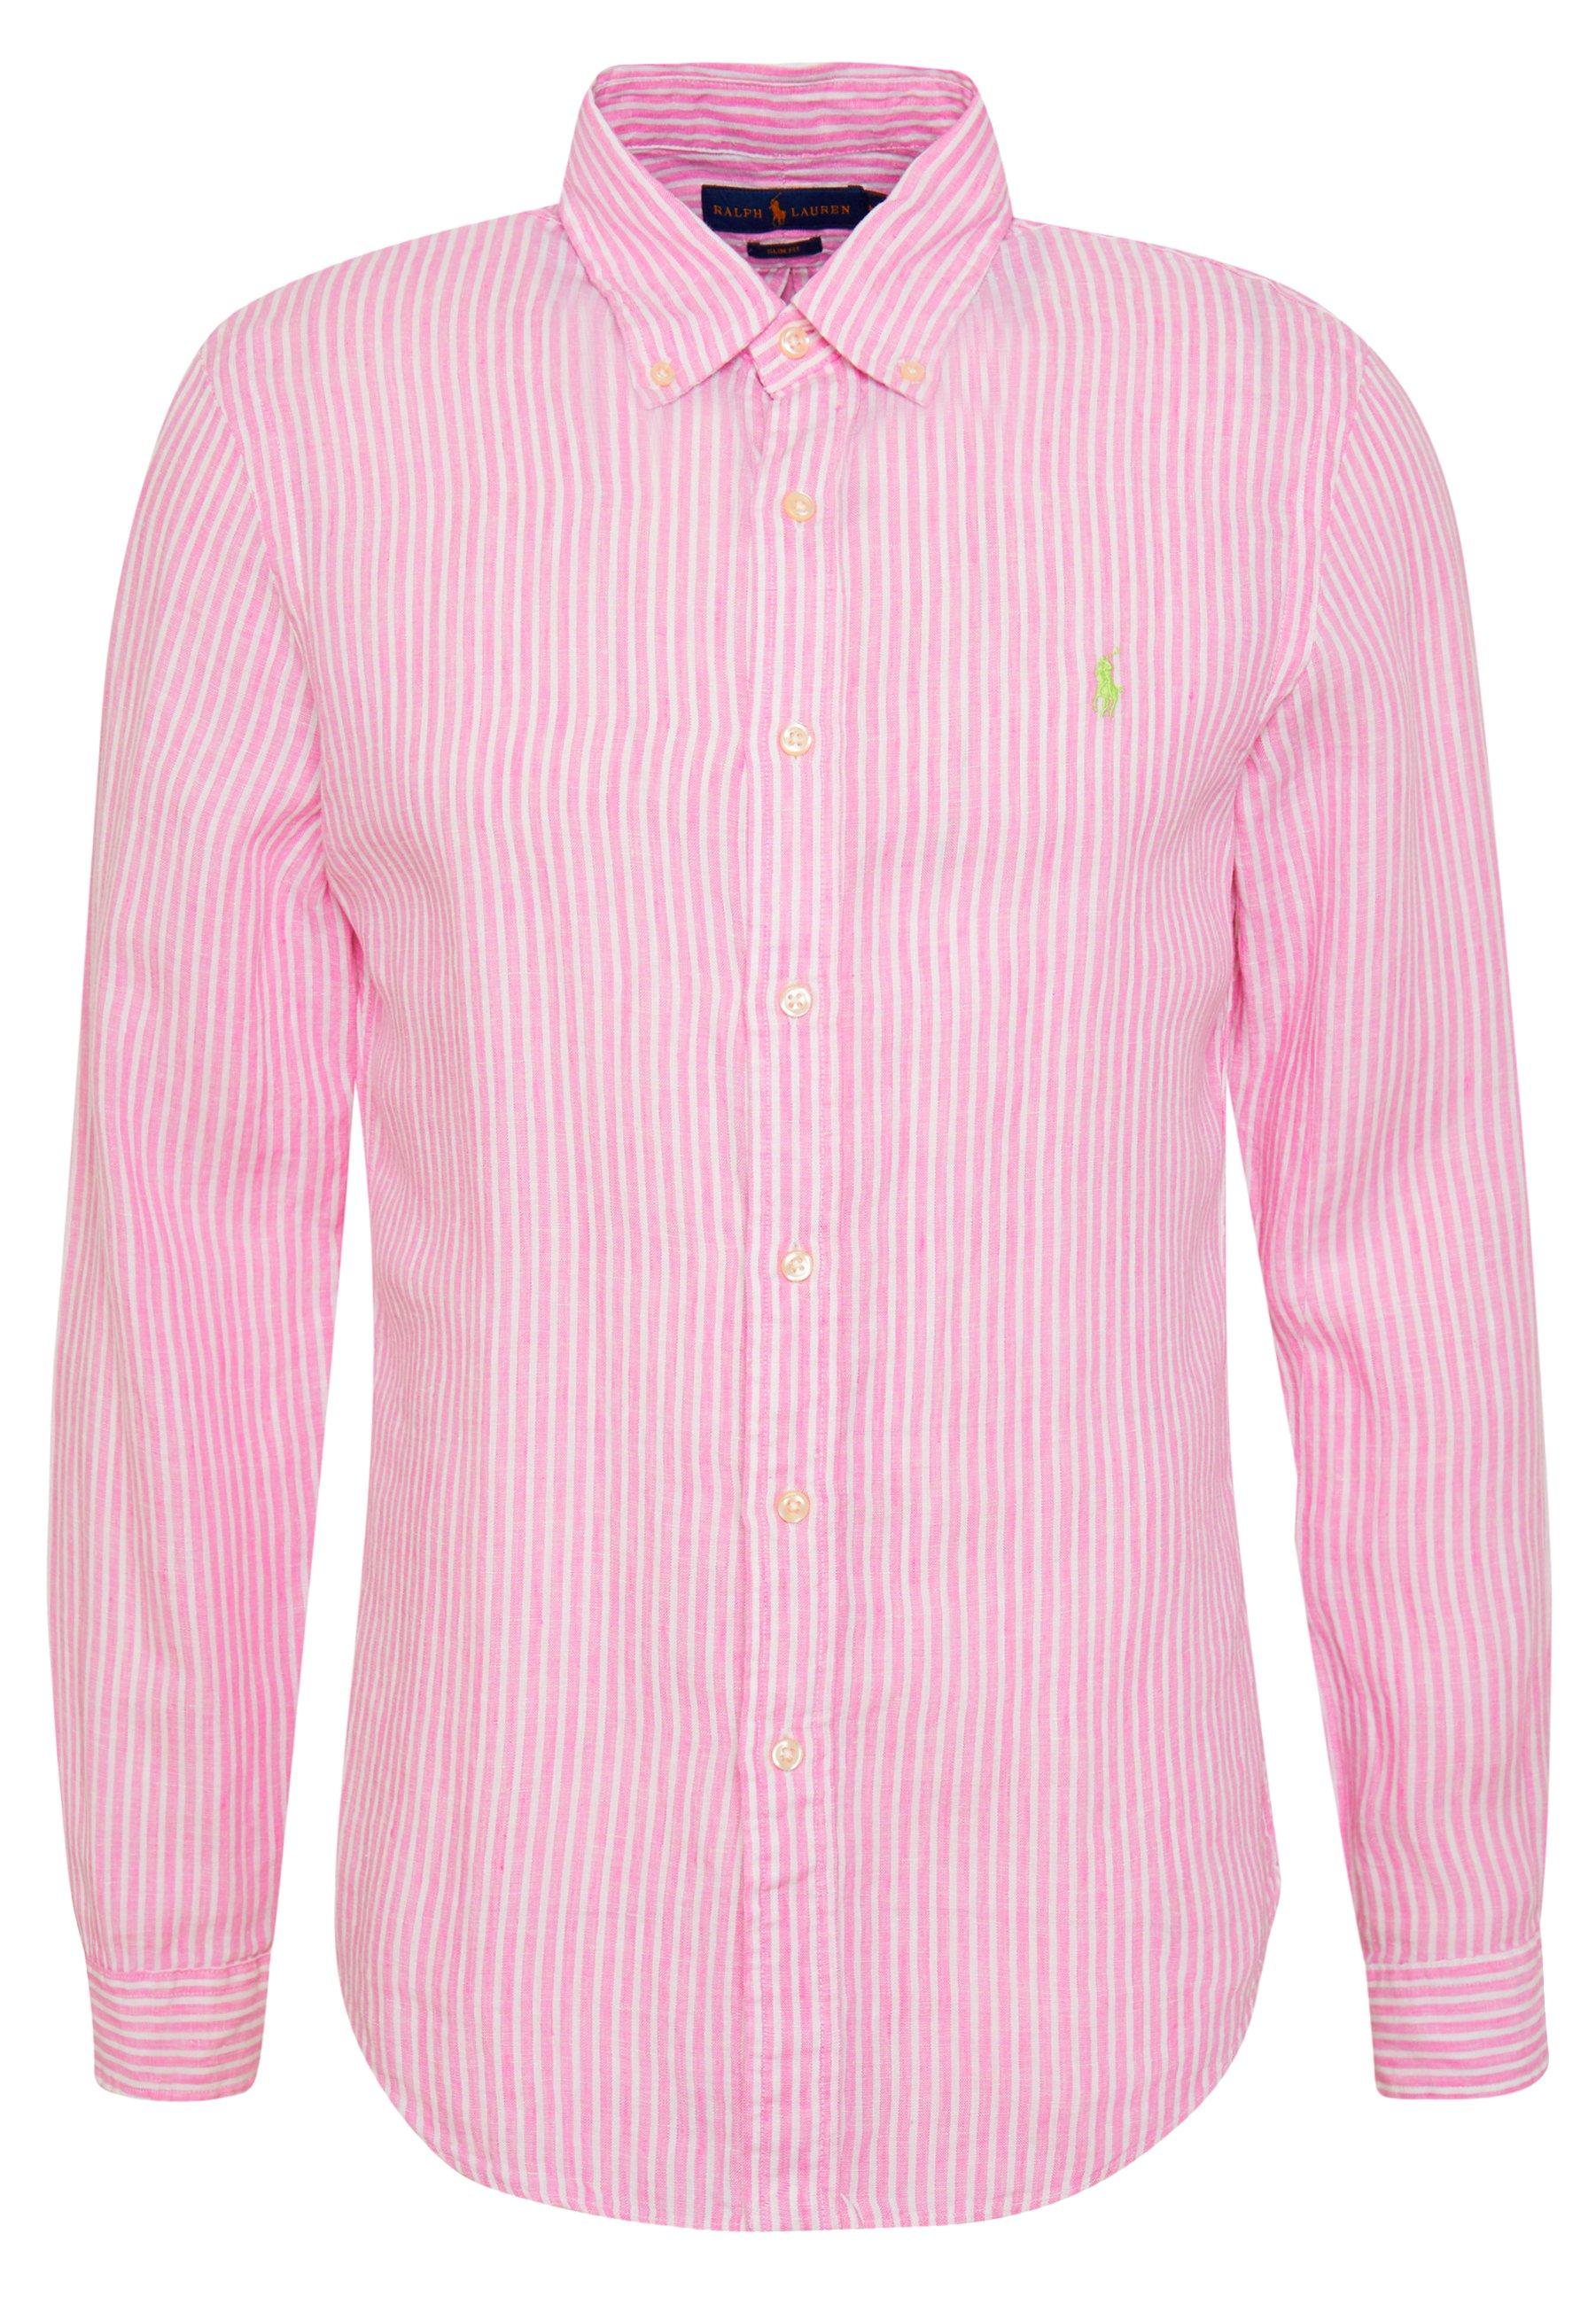 Polo Ralph Lauren Stripe Slim Fit - Chemise Pink/white bTcUANF